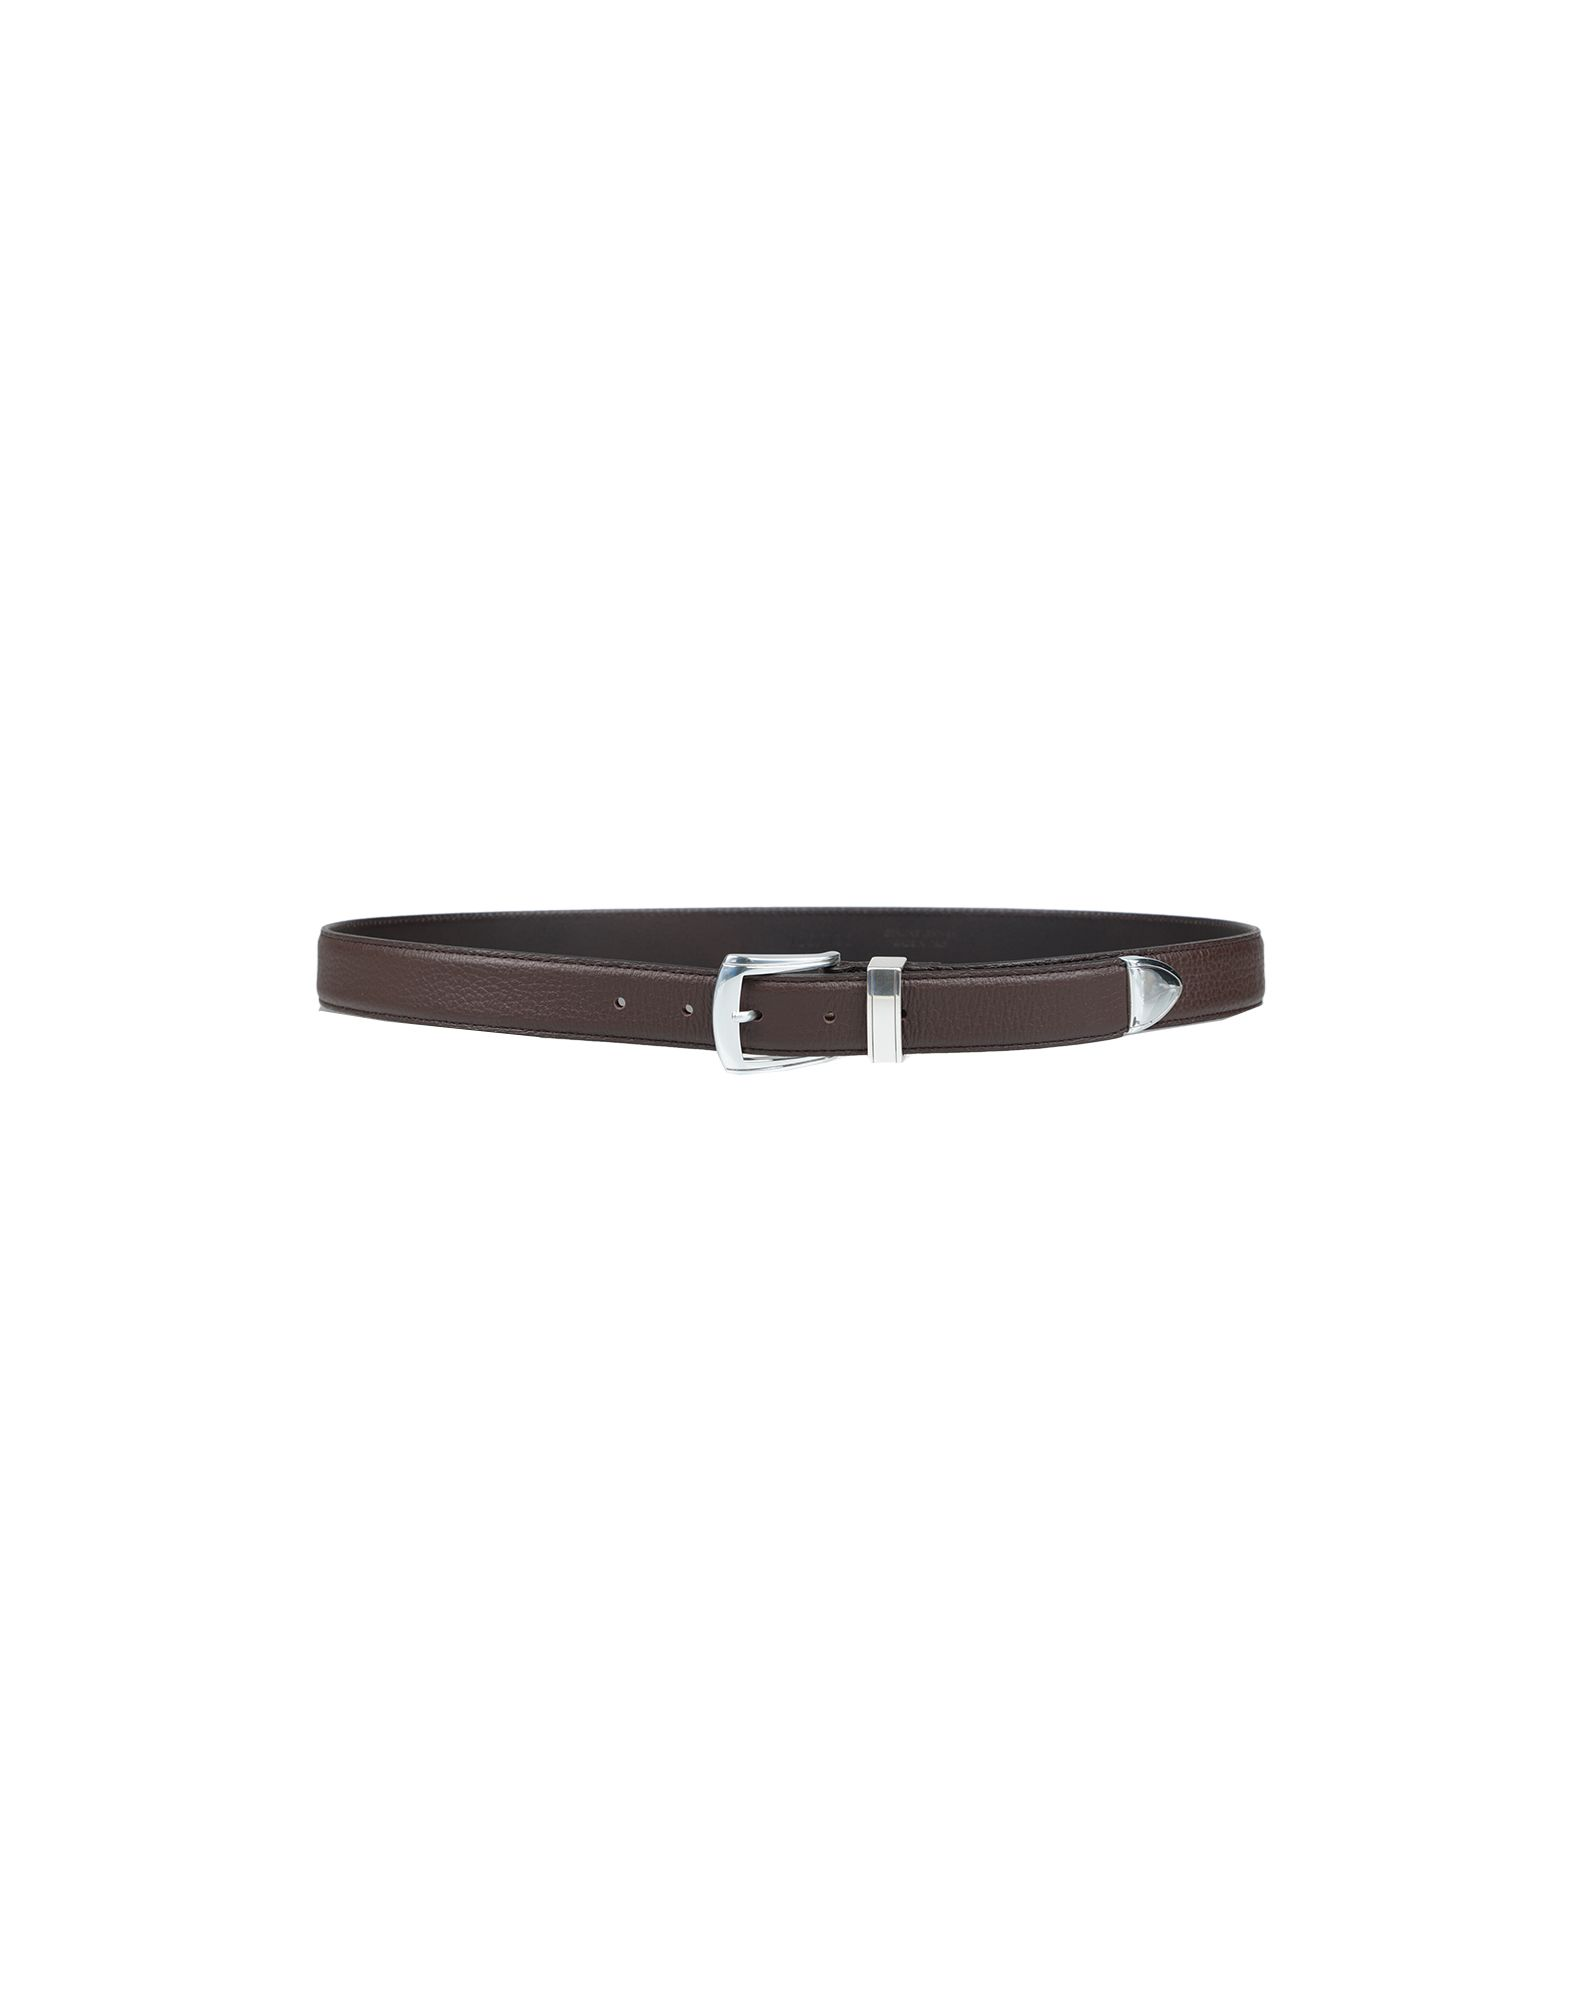 D'AMICO Belts in Black